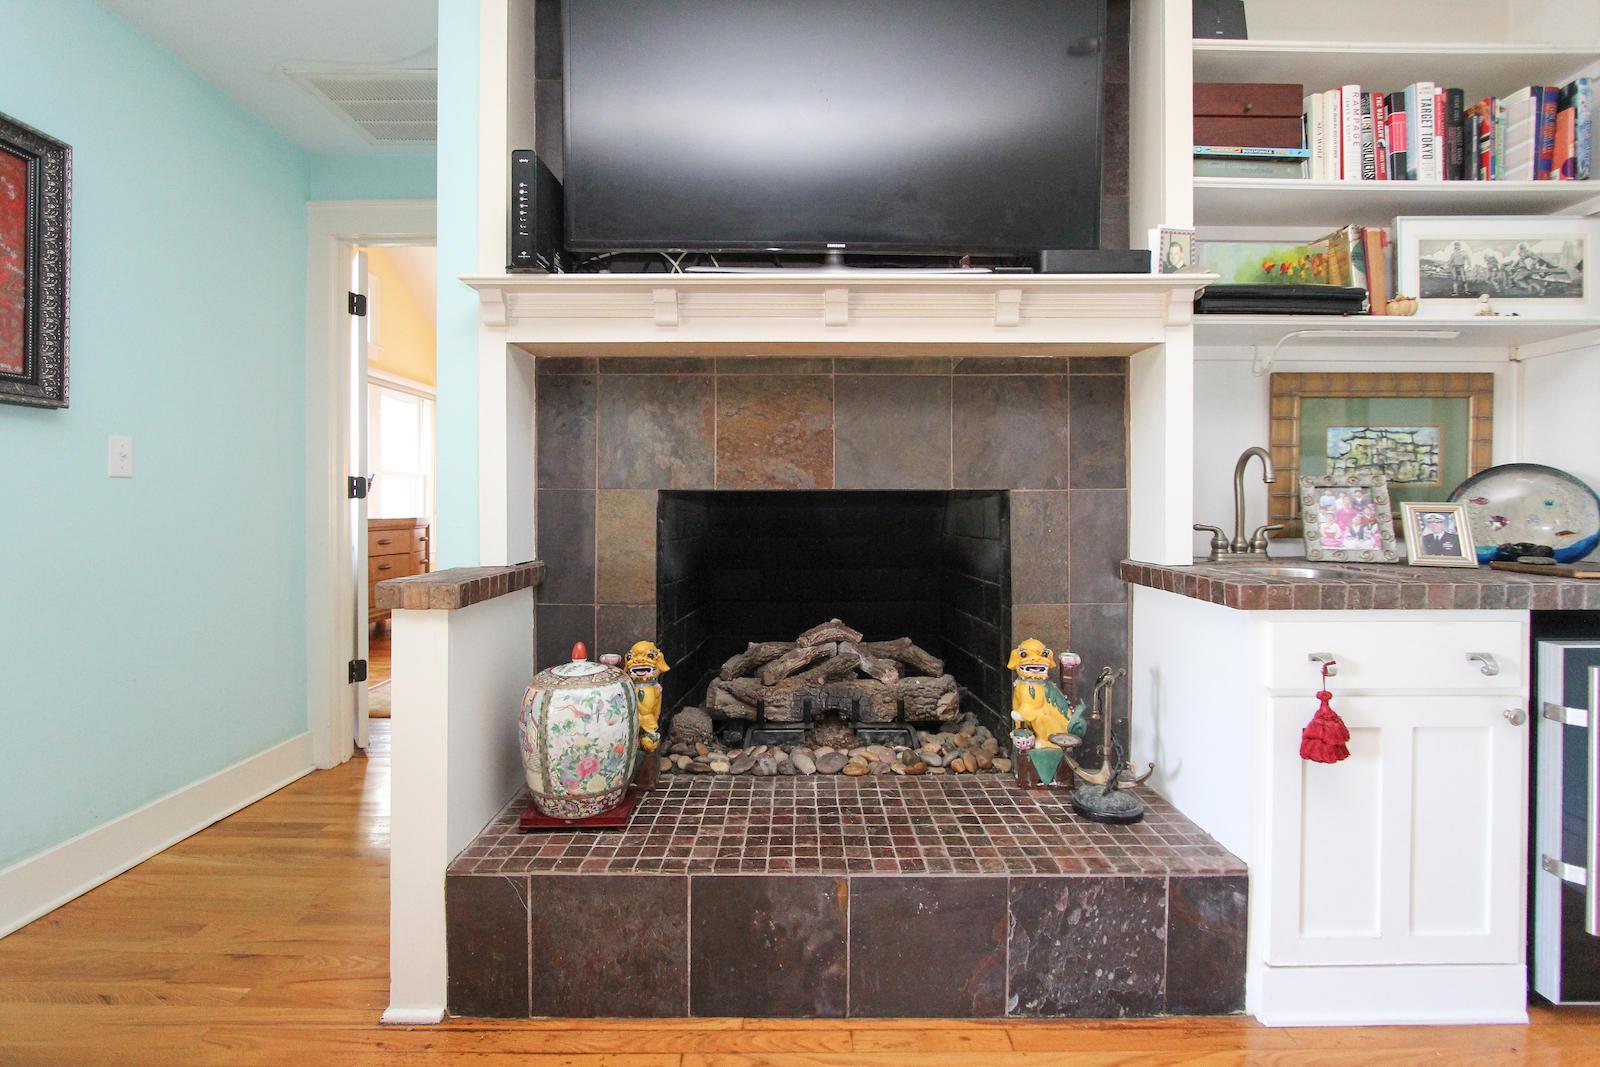 Albemarle Point Homes For Sale - 3 Albemarle, Charleston, SC - 10